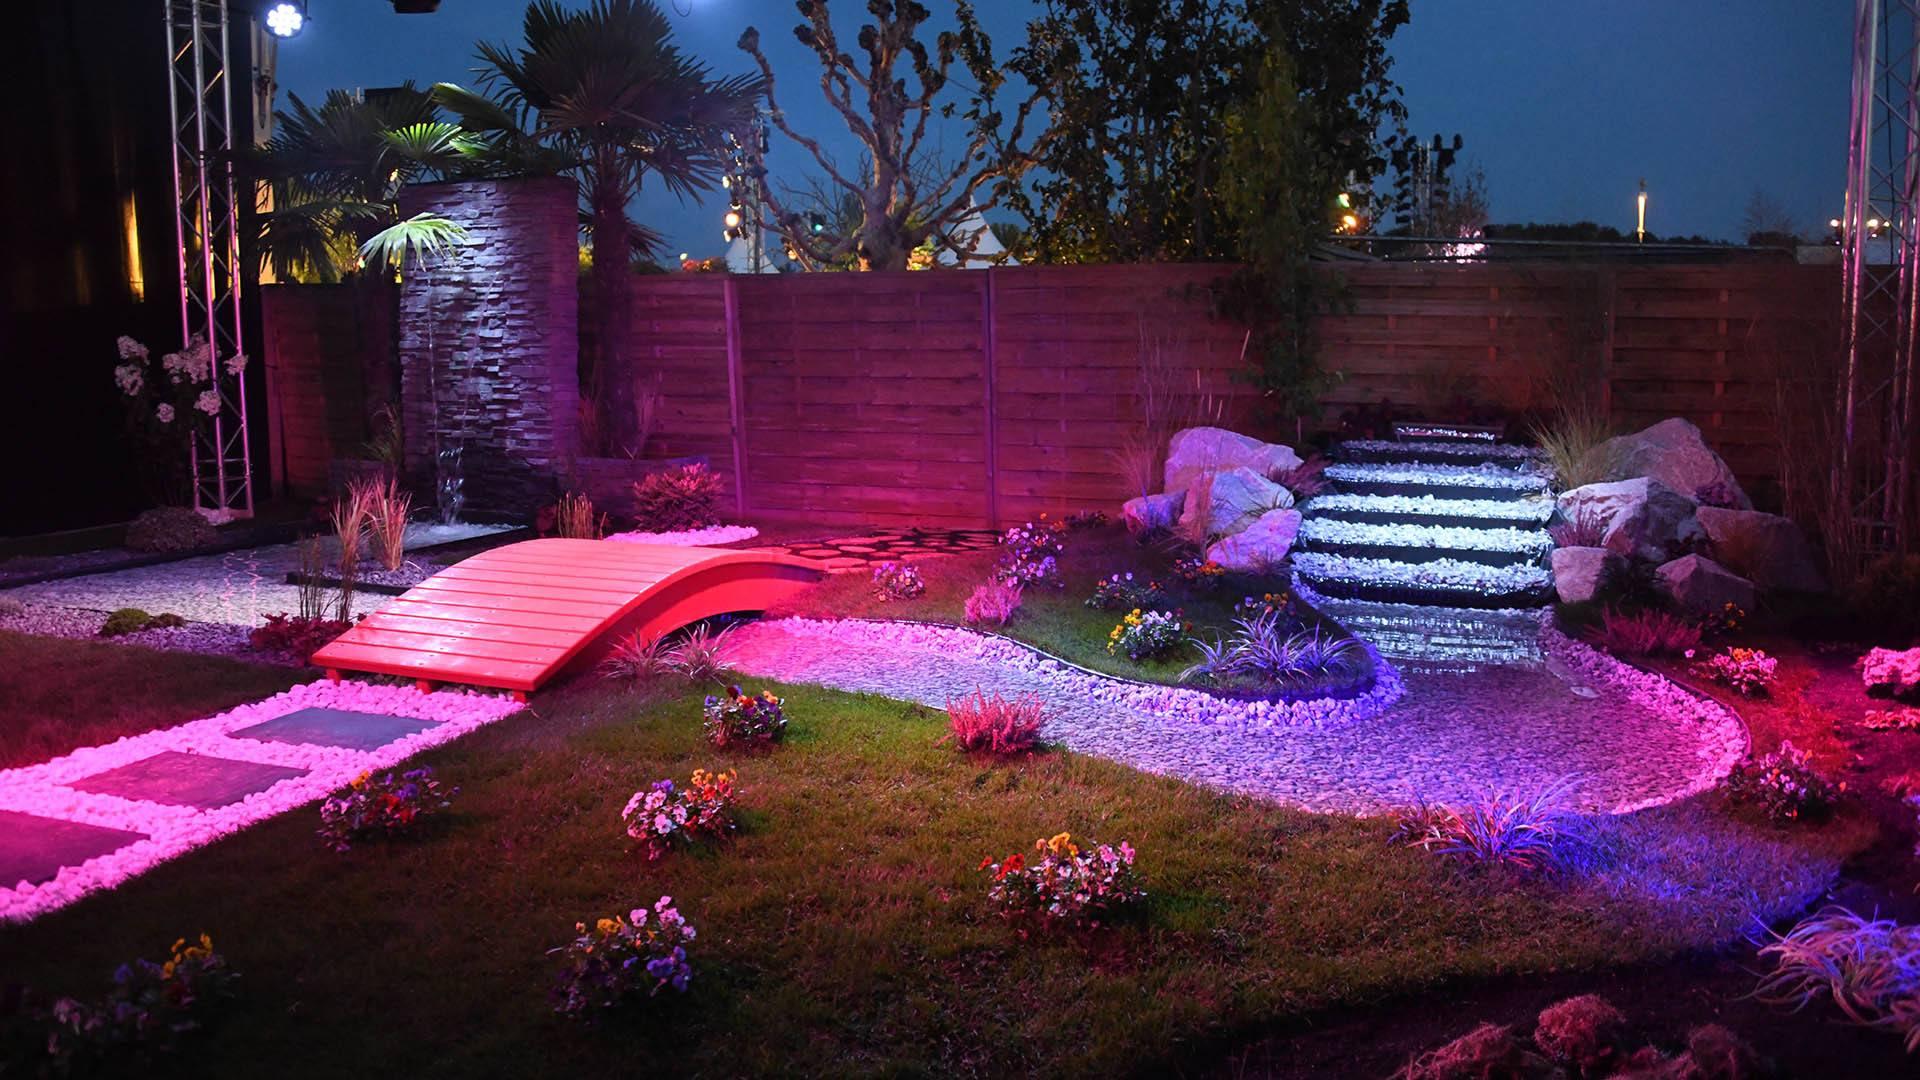 Jardiniers de Folie Flore quel talent : Wittenheim